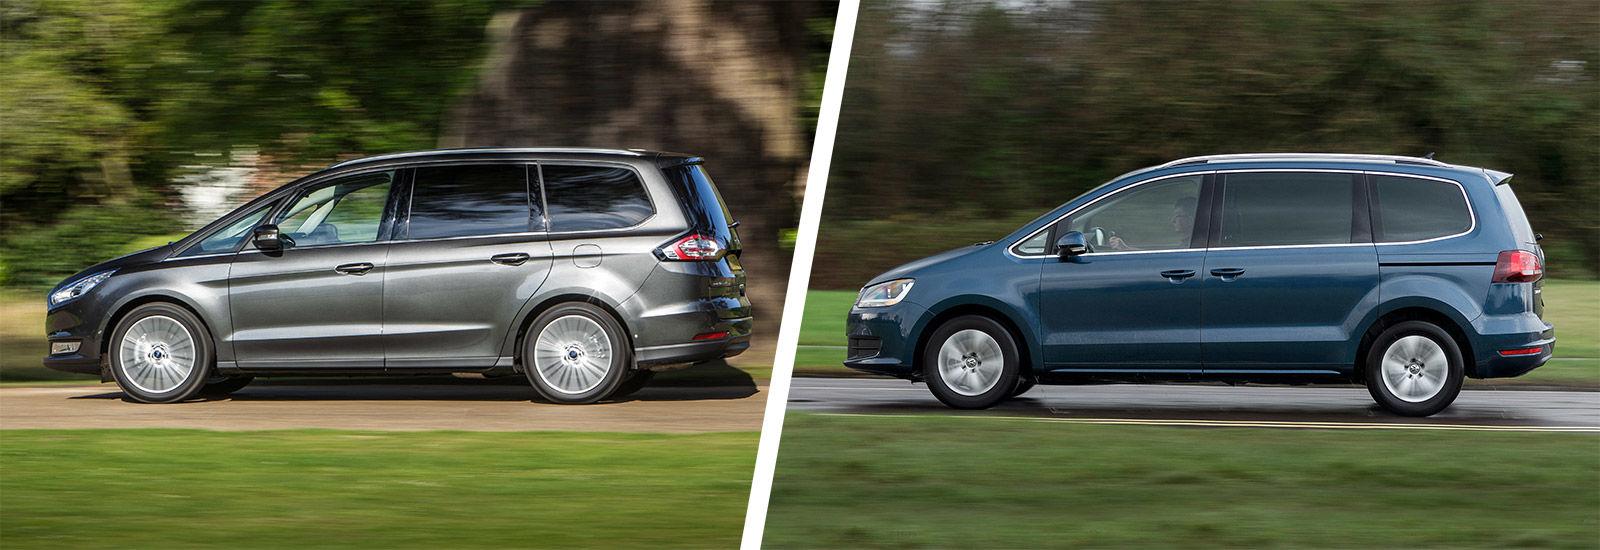 Sliding interior doors - Ford Galaxy Vs Volkswagen Sharan Mpv Comparison Carwow